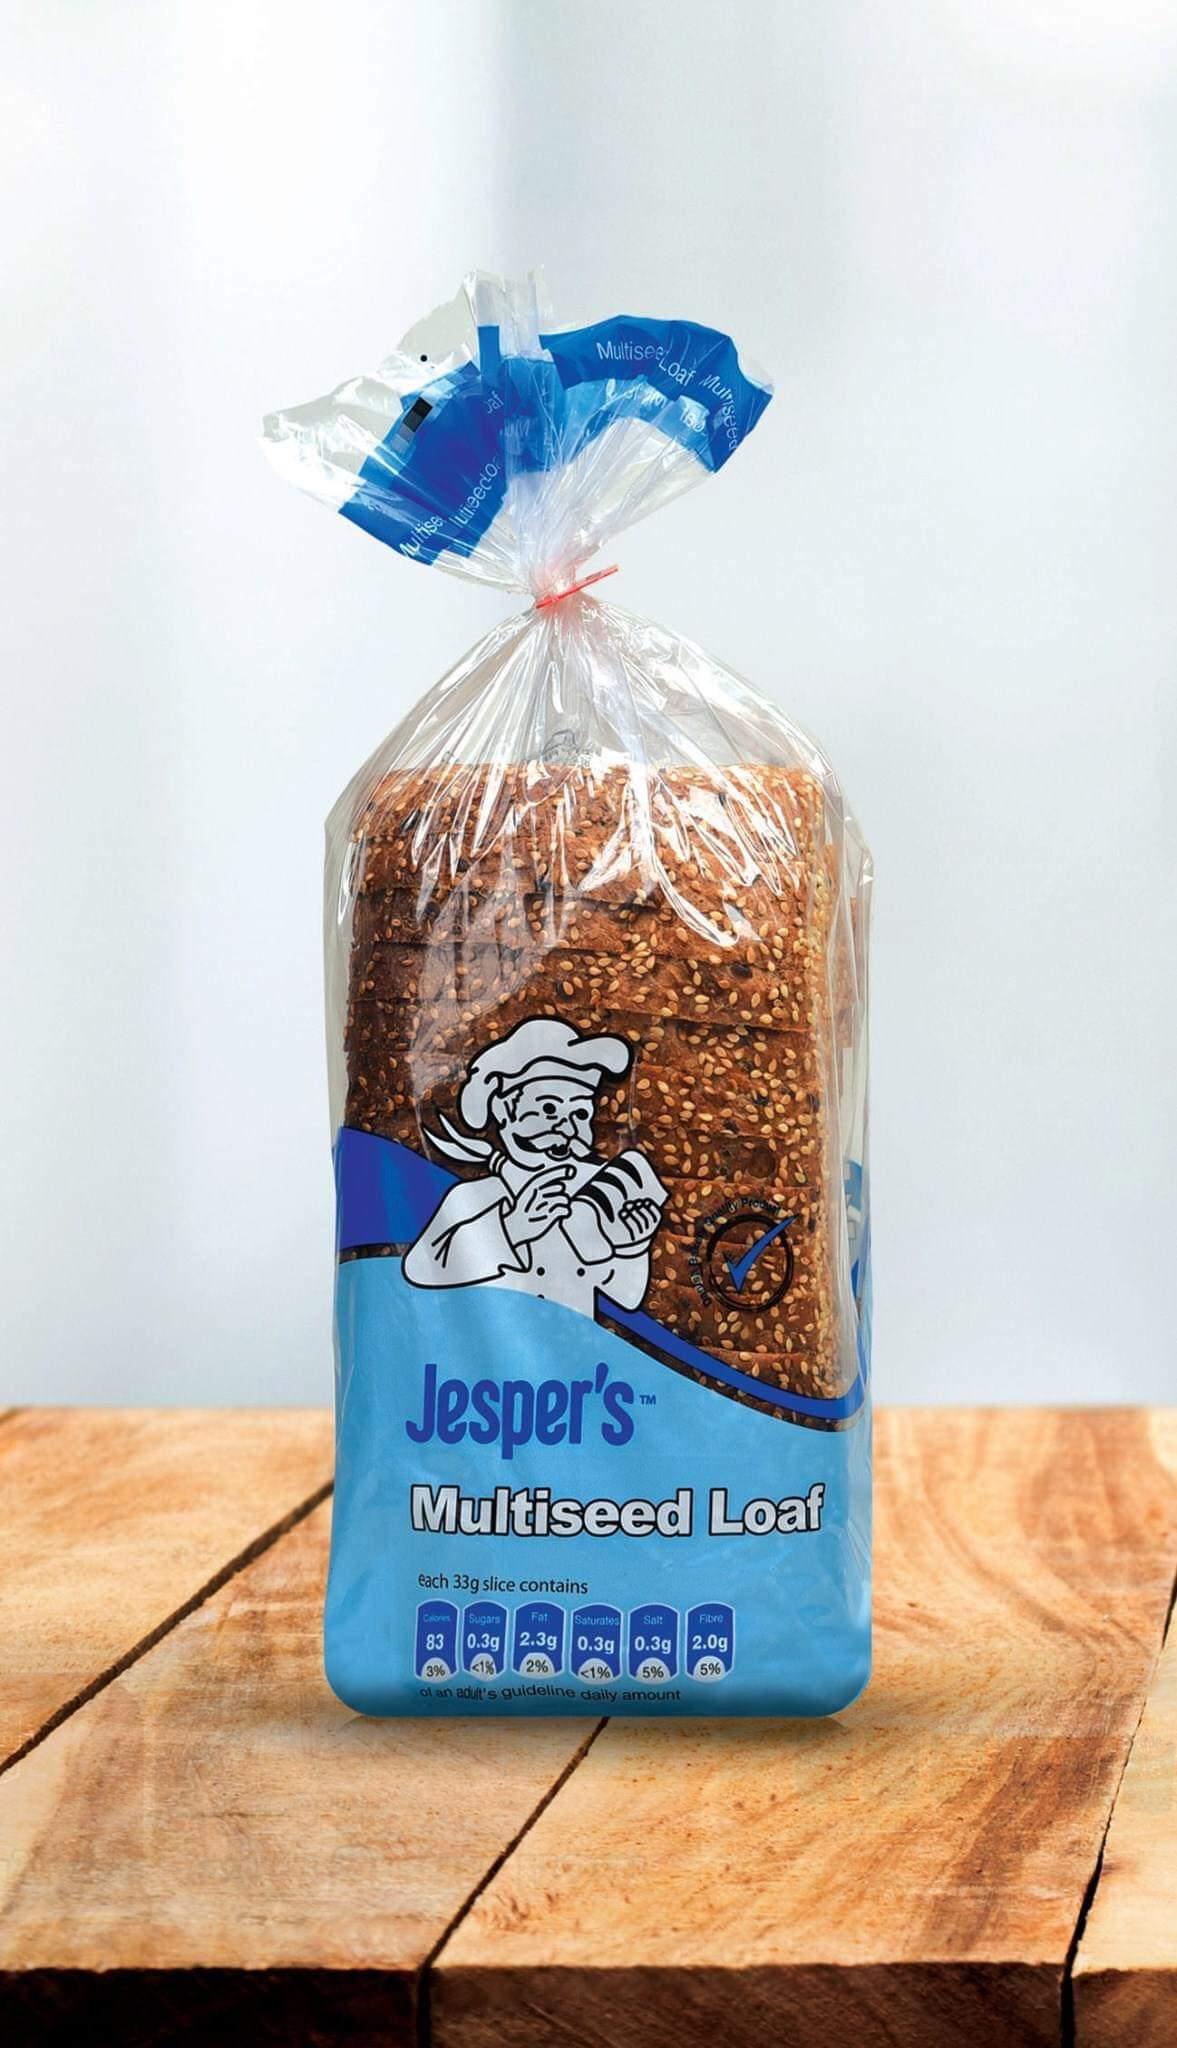 Jespers Multiseed Loaf